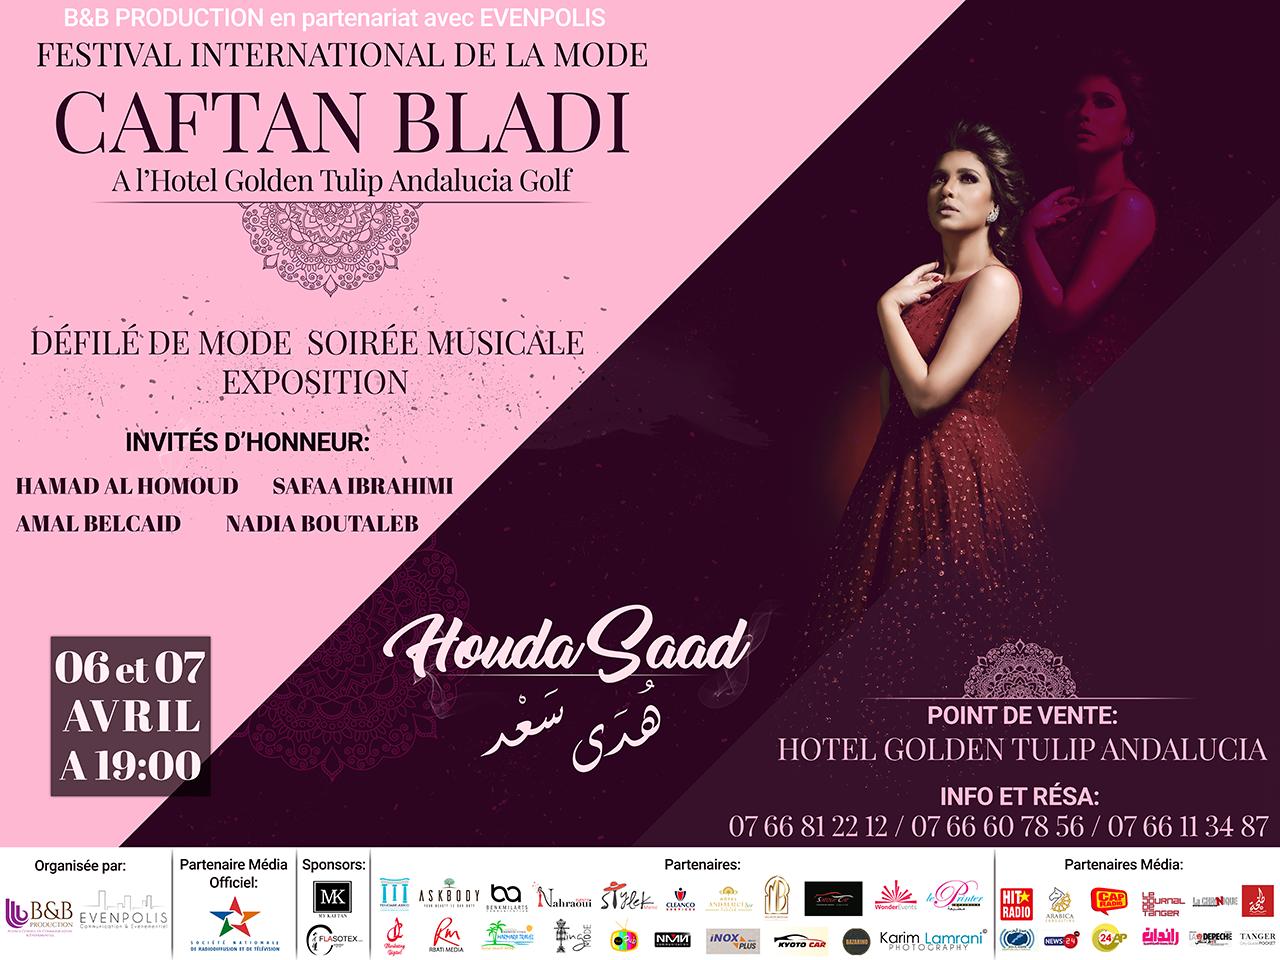 Design Houda Saad Poster Caftan Bladi